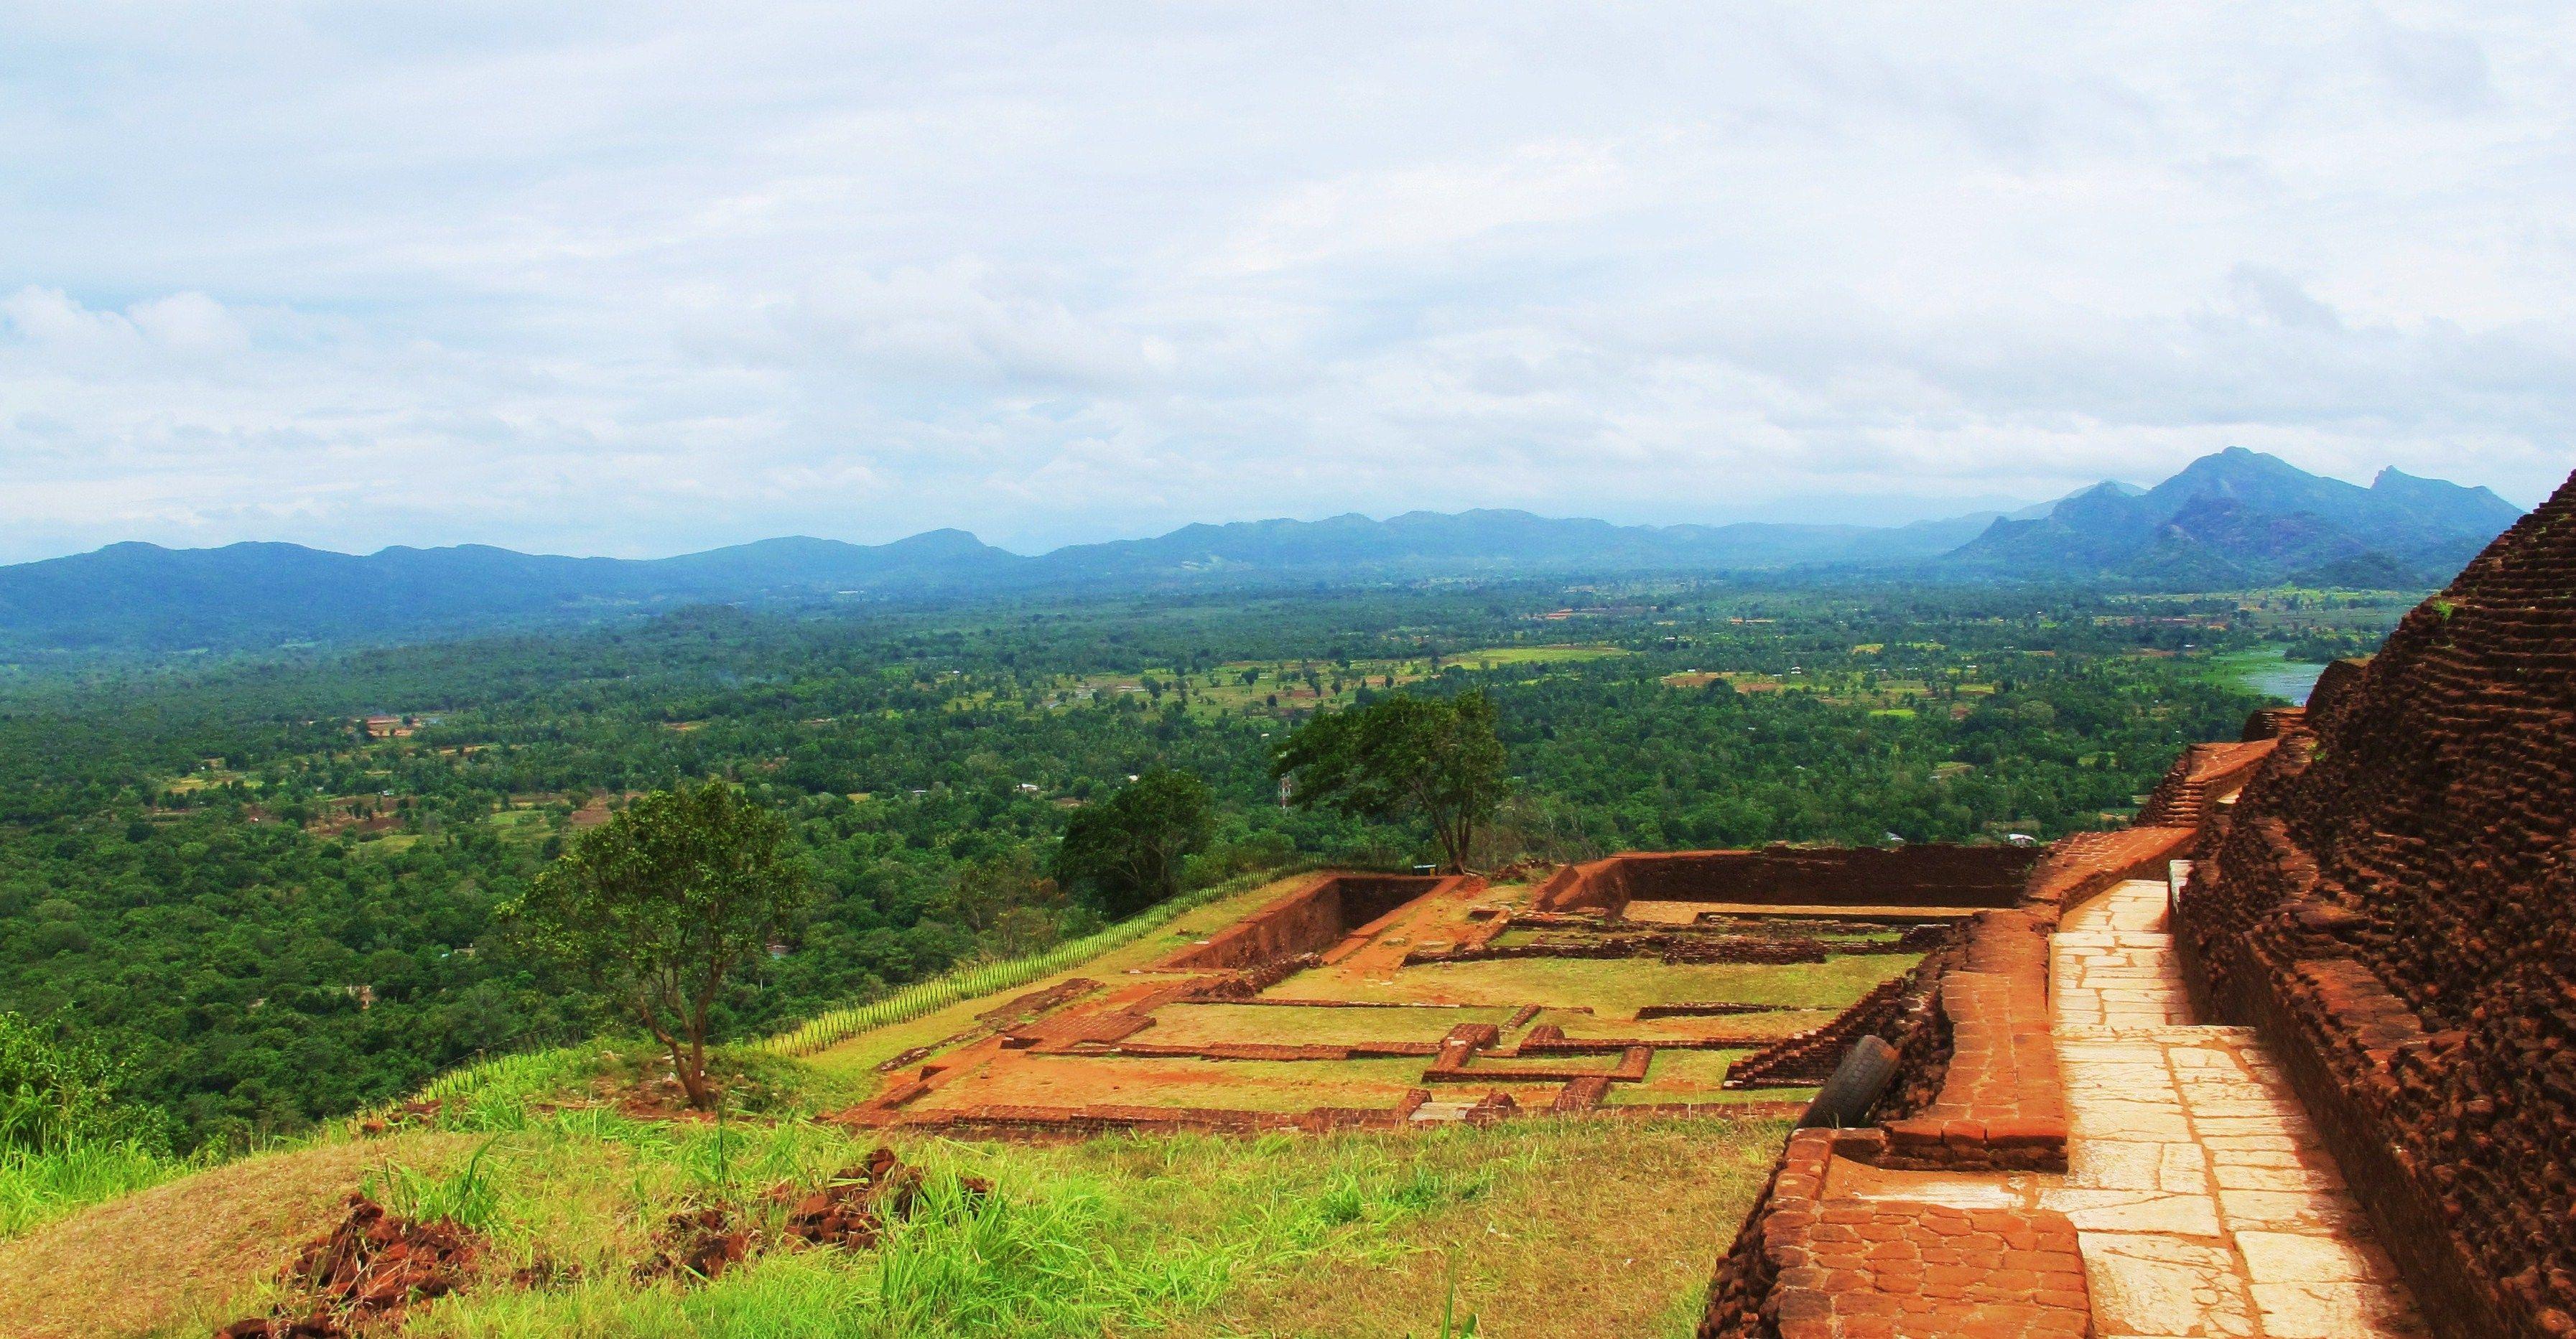 View from Sigiriya Rock, Sri Lanka